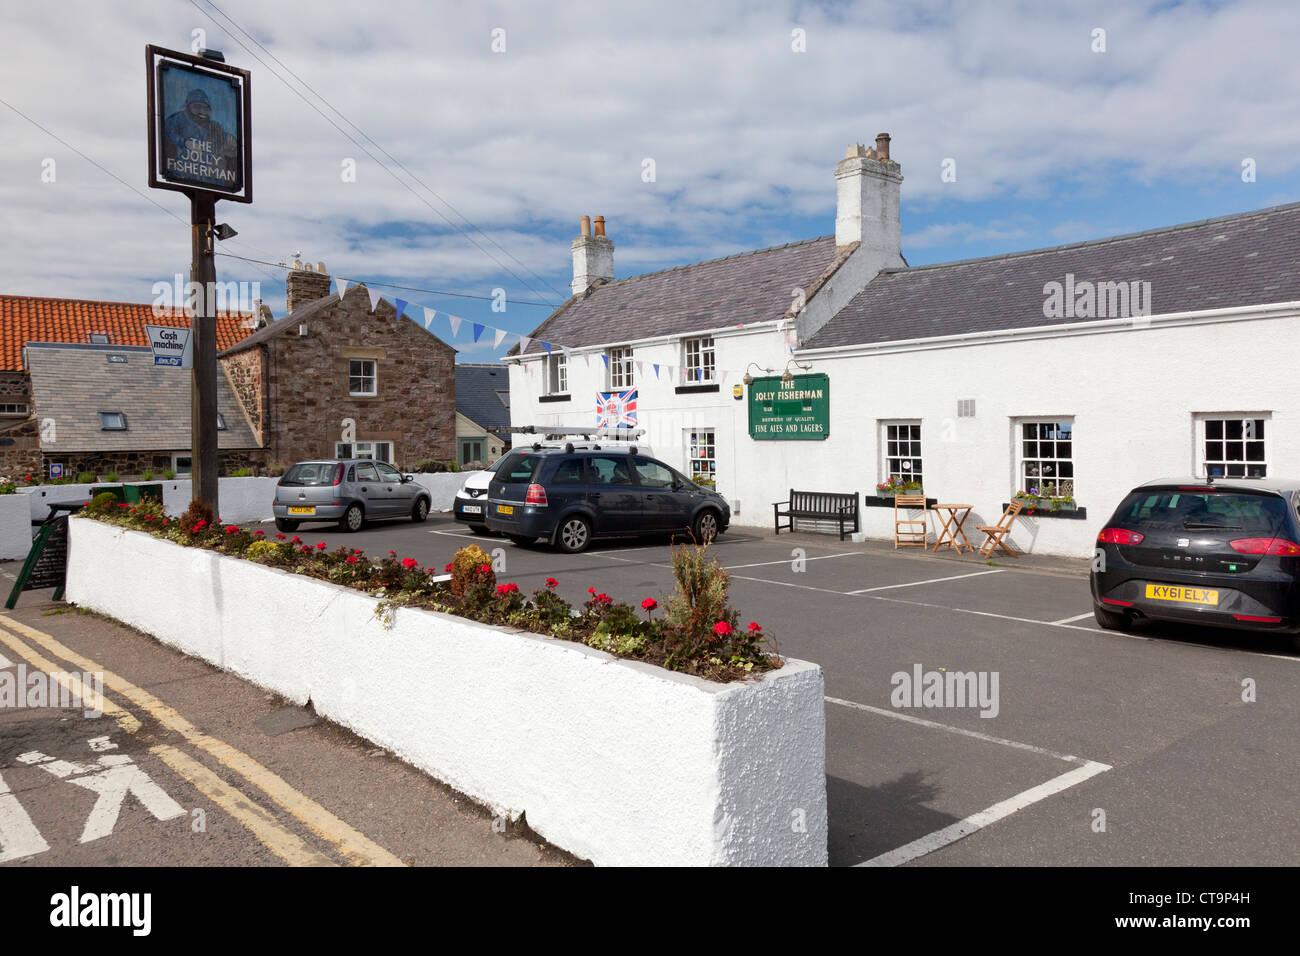 The Jolly Fisherman pub, Craster, Northumberland - Stock Image